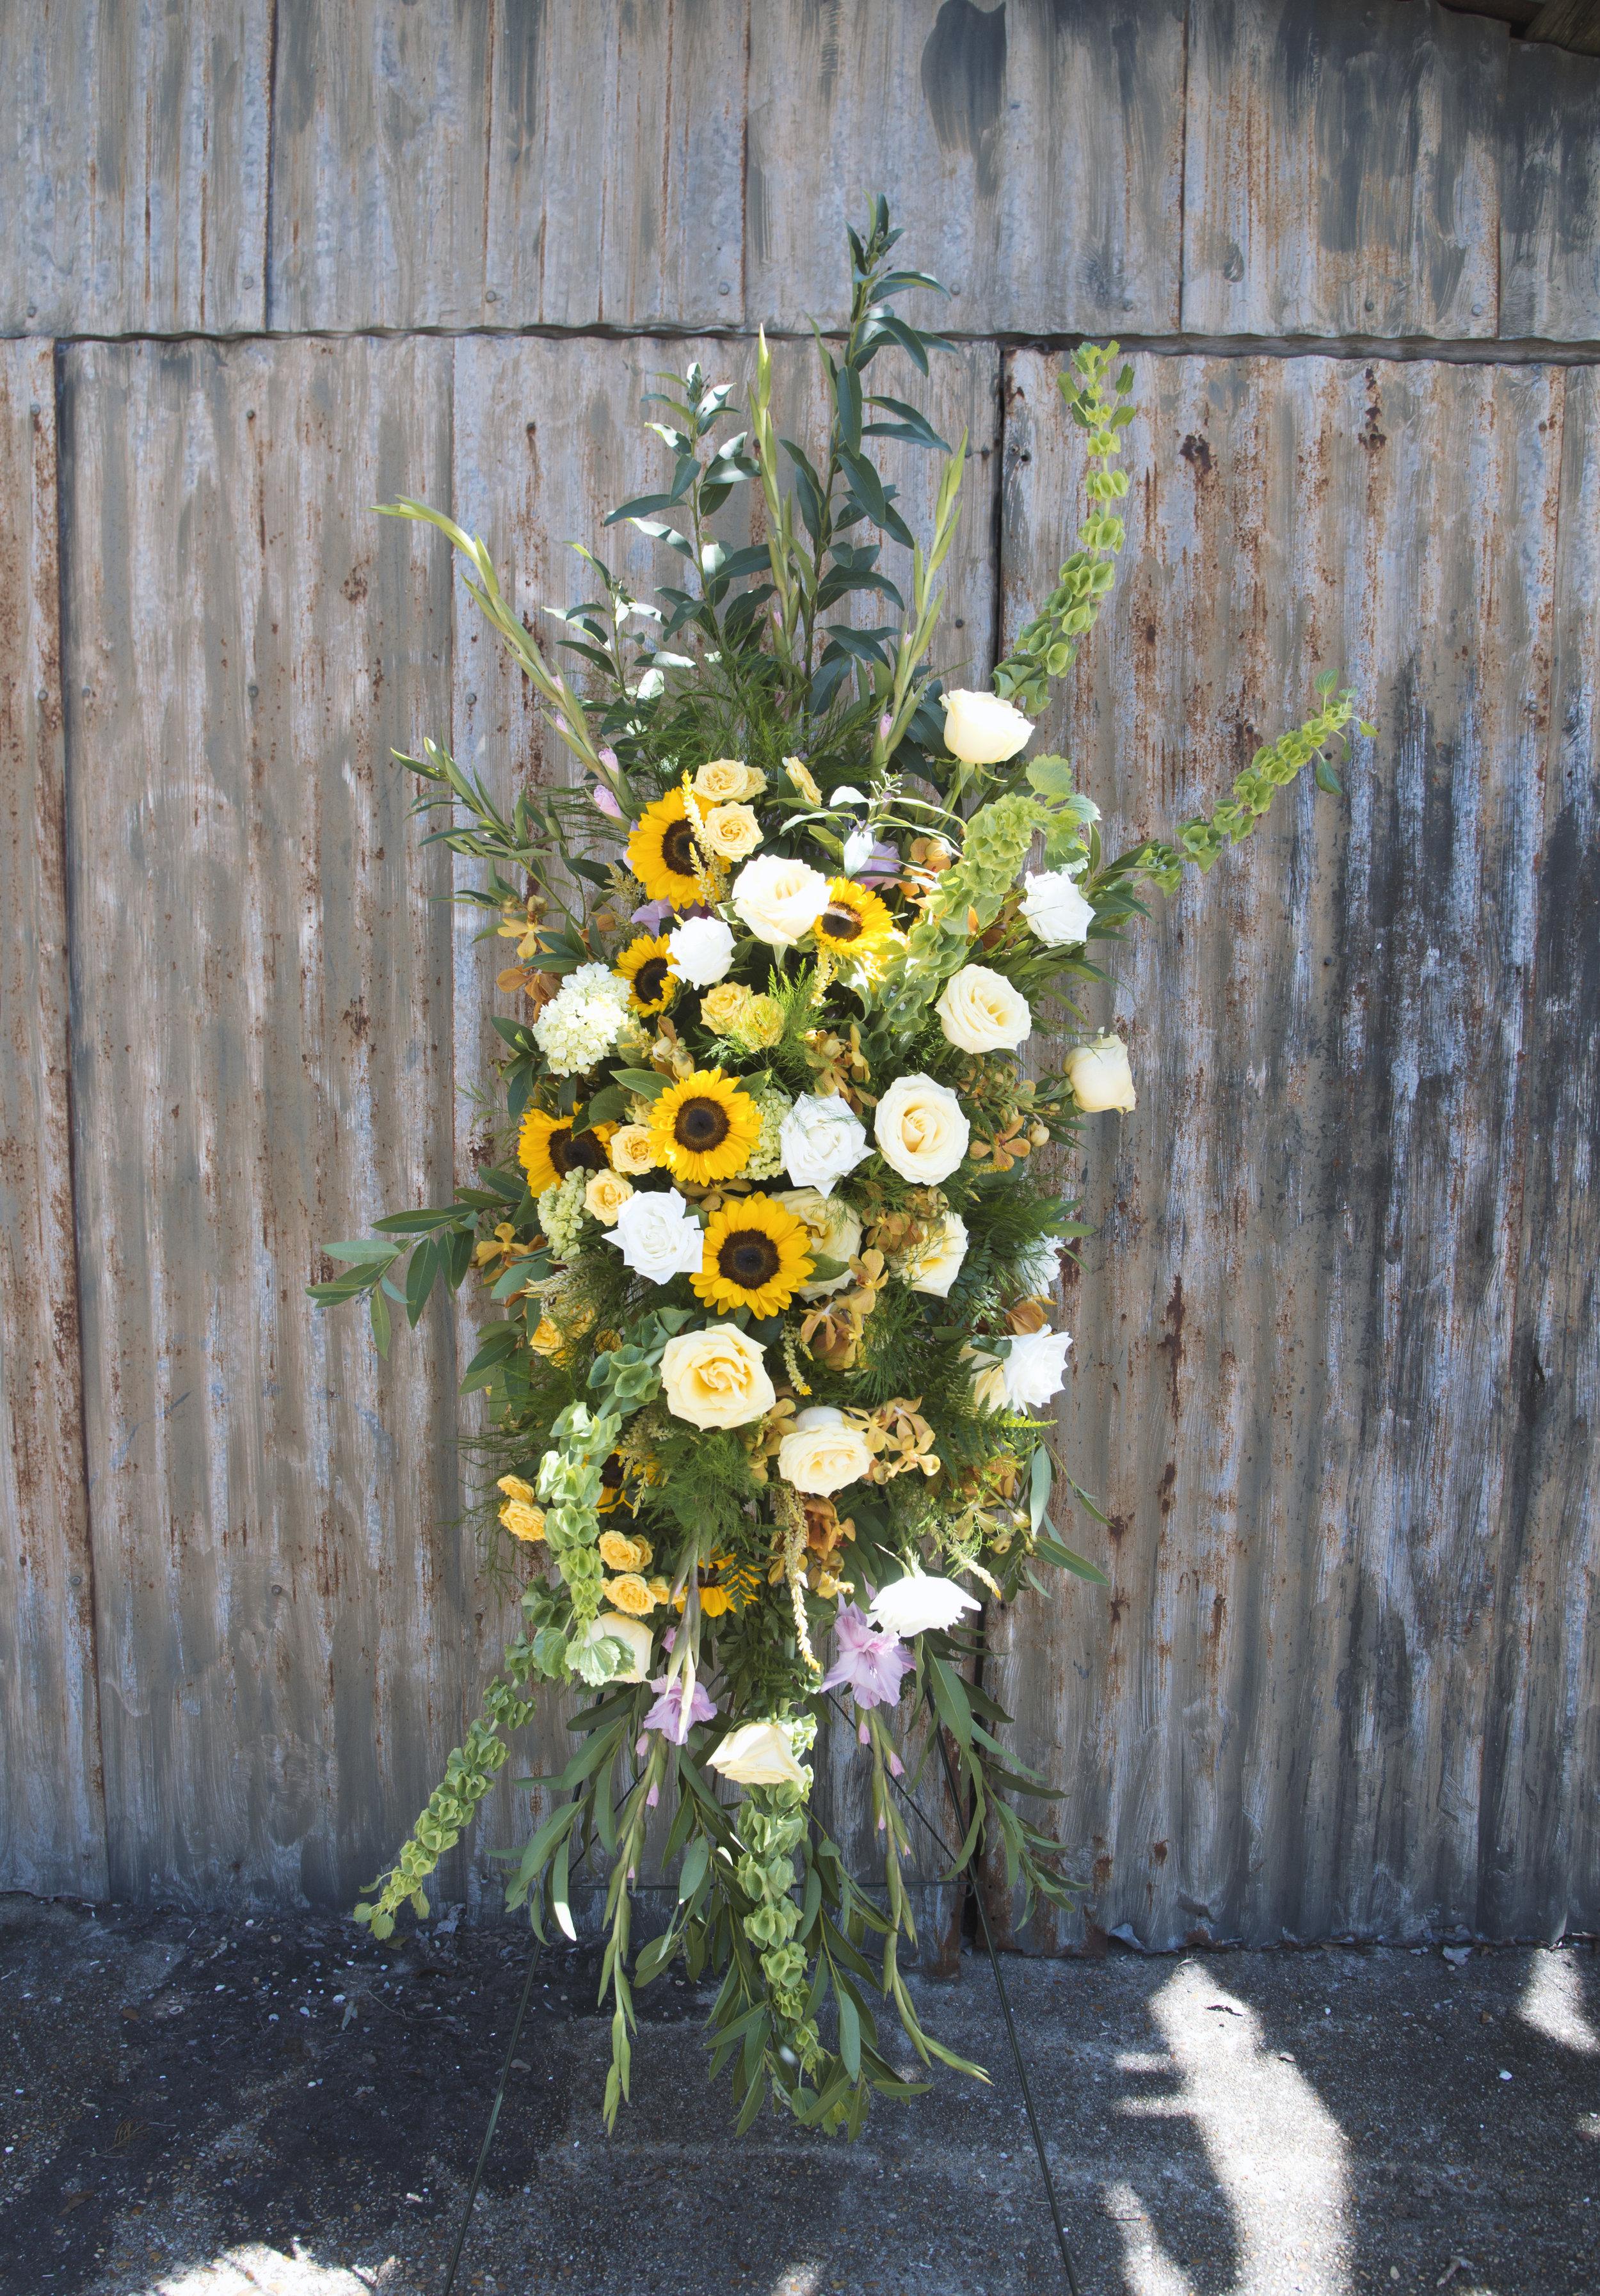 standing funeral spray mitchs flowers denys mertz 250.jpg